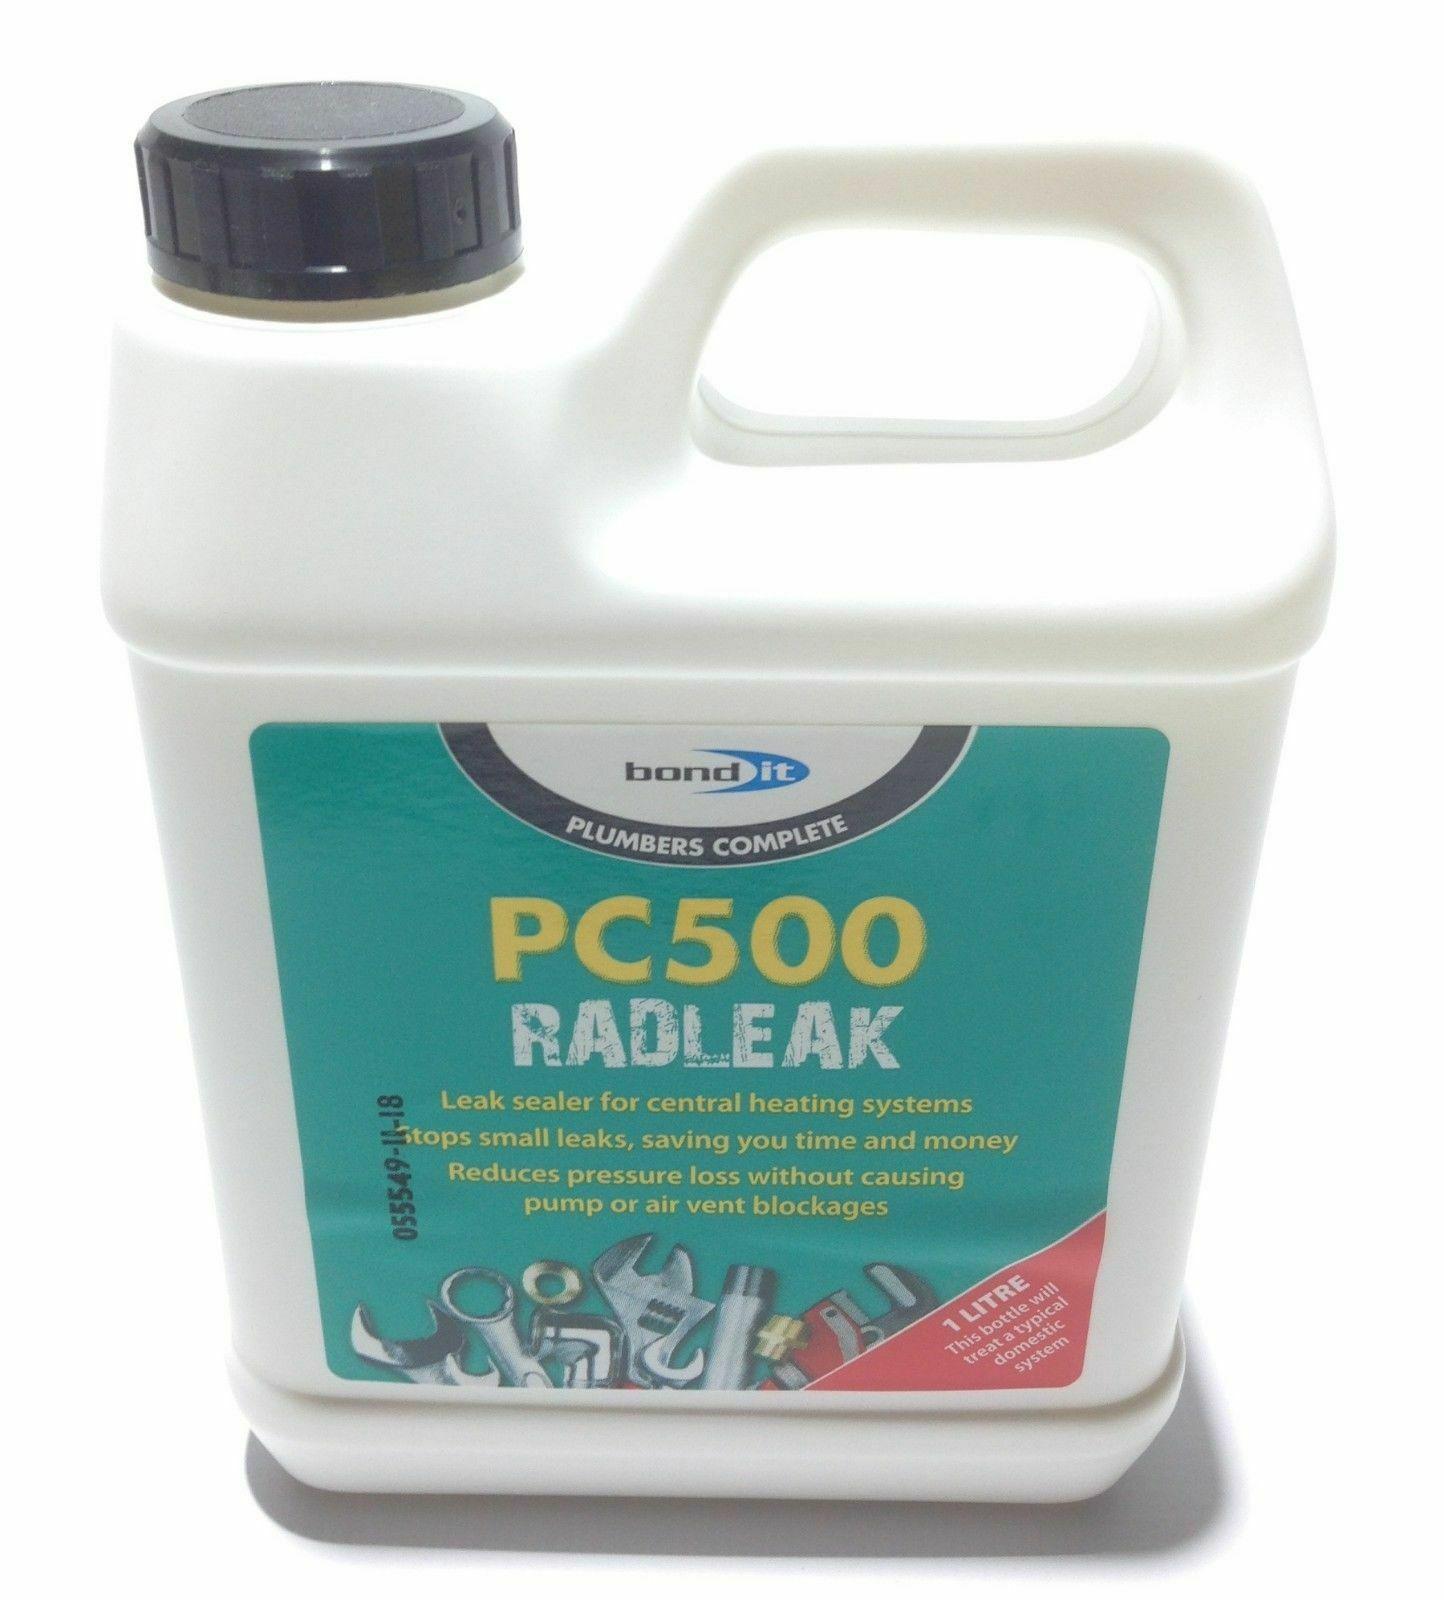 Radiator Boiler Central Heating System Pipe Leak Sealer PC500 Rad Leak